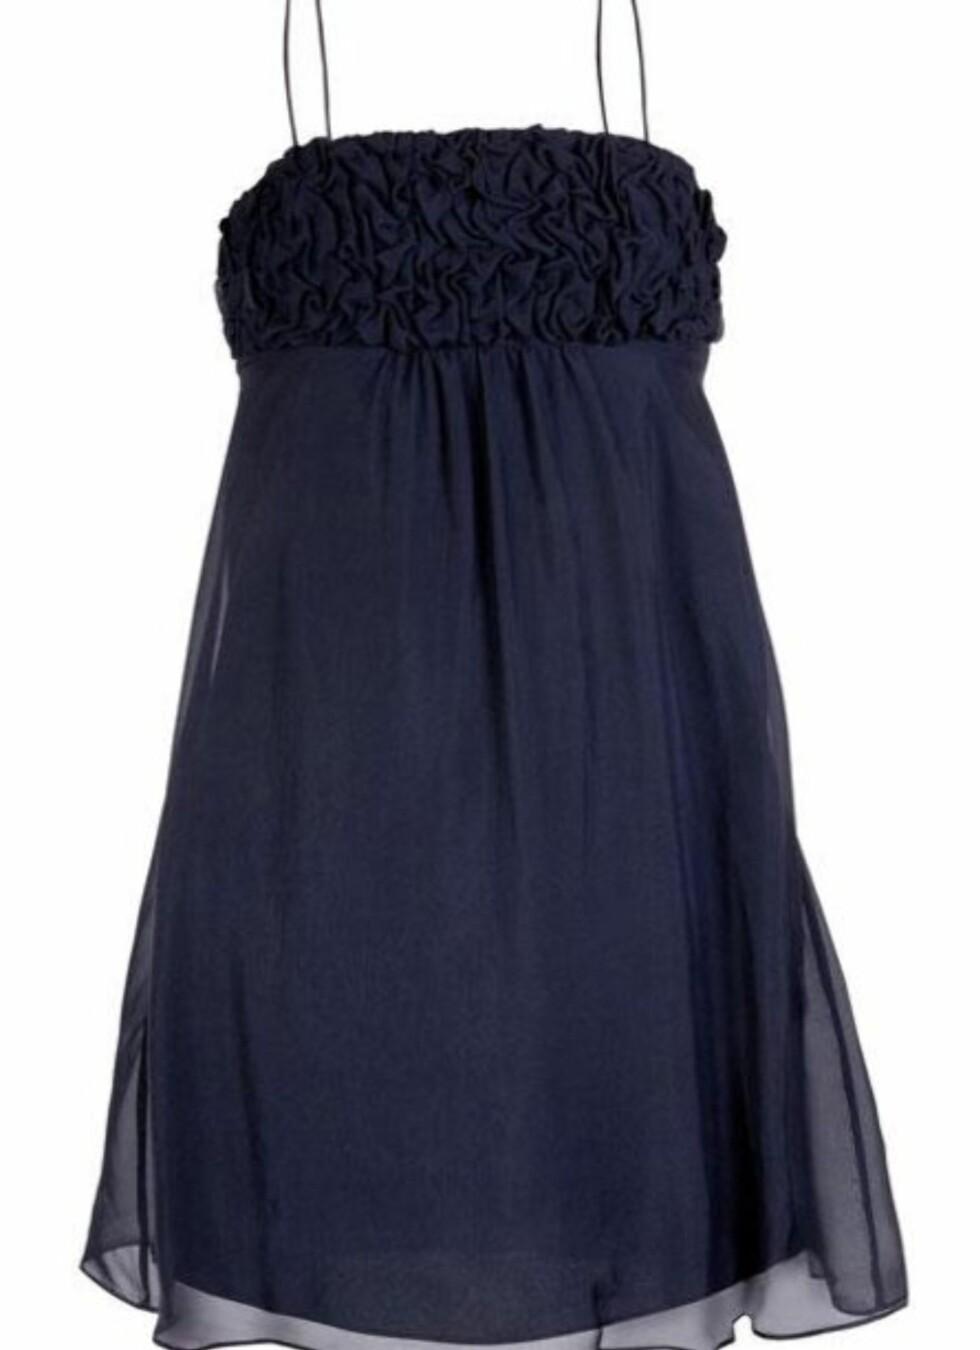 SPAR 825 KEONER: Mørkeblå kjole i klassisk stil (kr 825, Paul & Joe Sister/Fashionmixology.no).